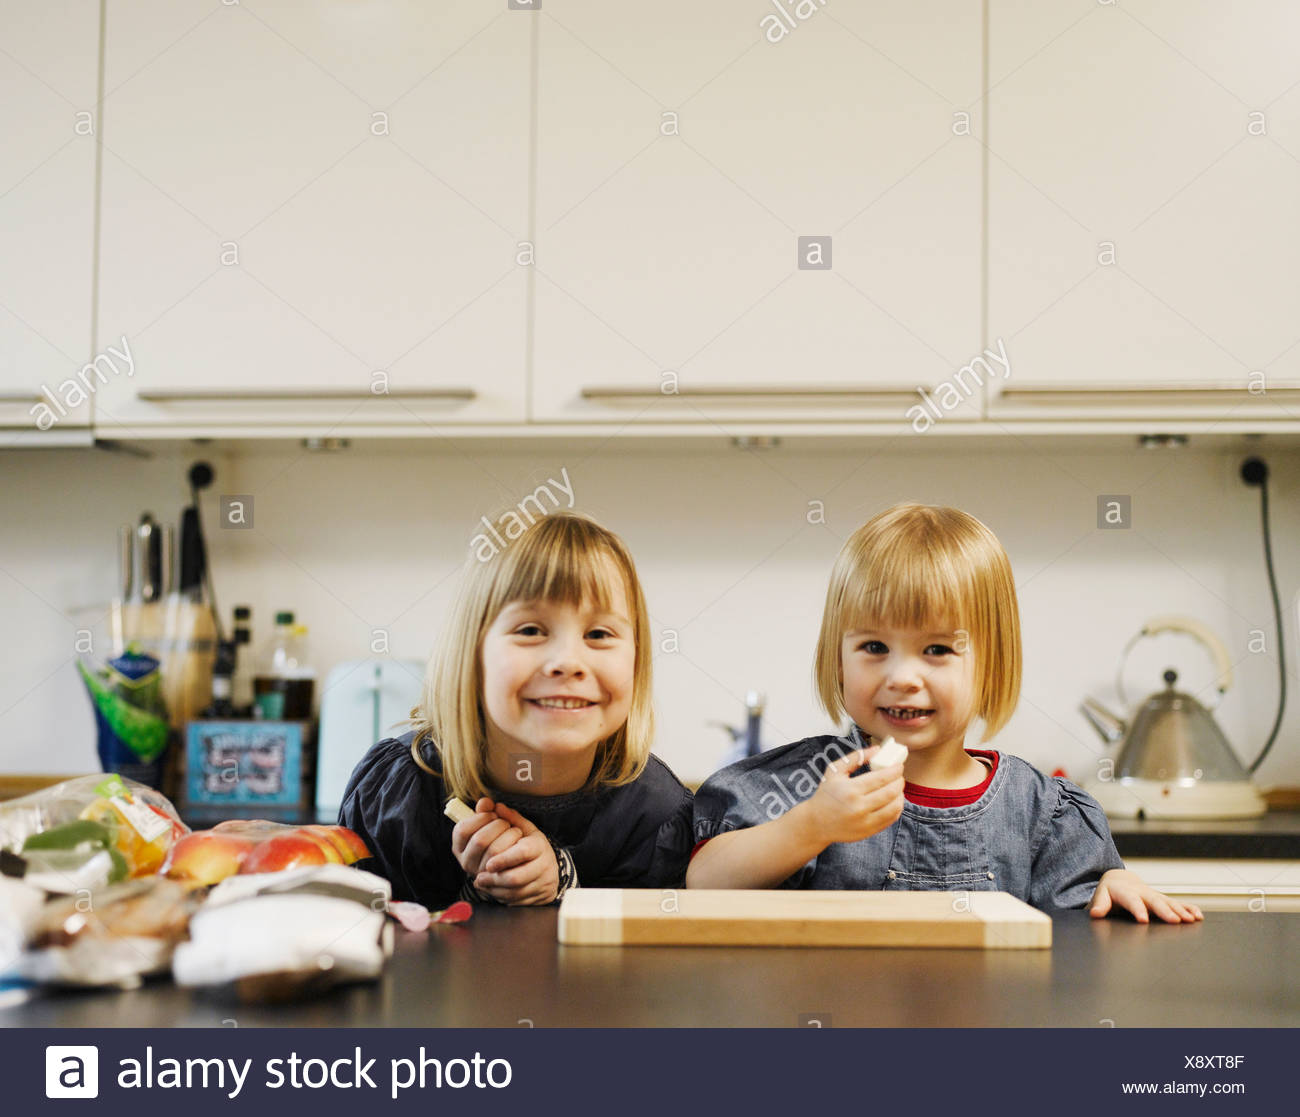 Smiling girls eating in kitchen - Stock Image